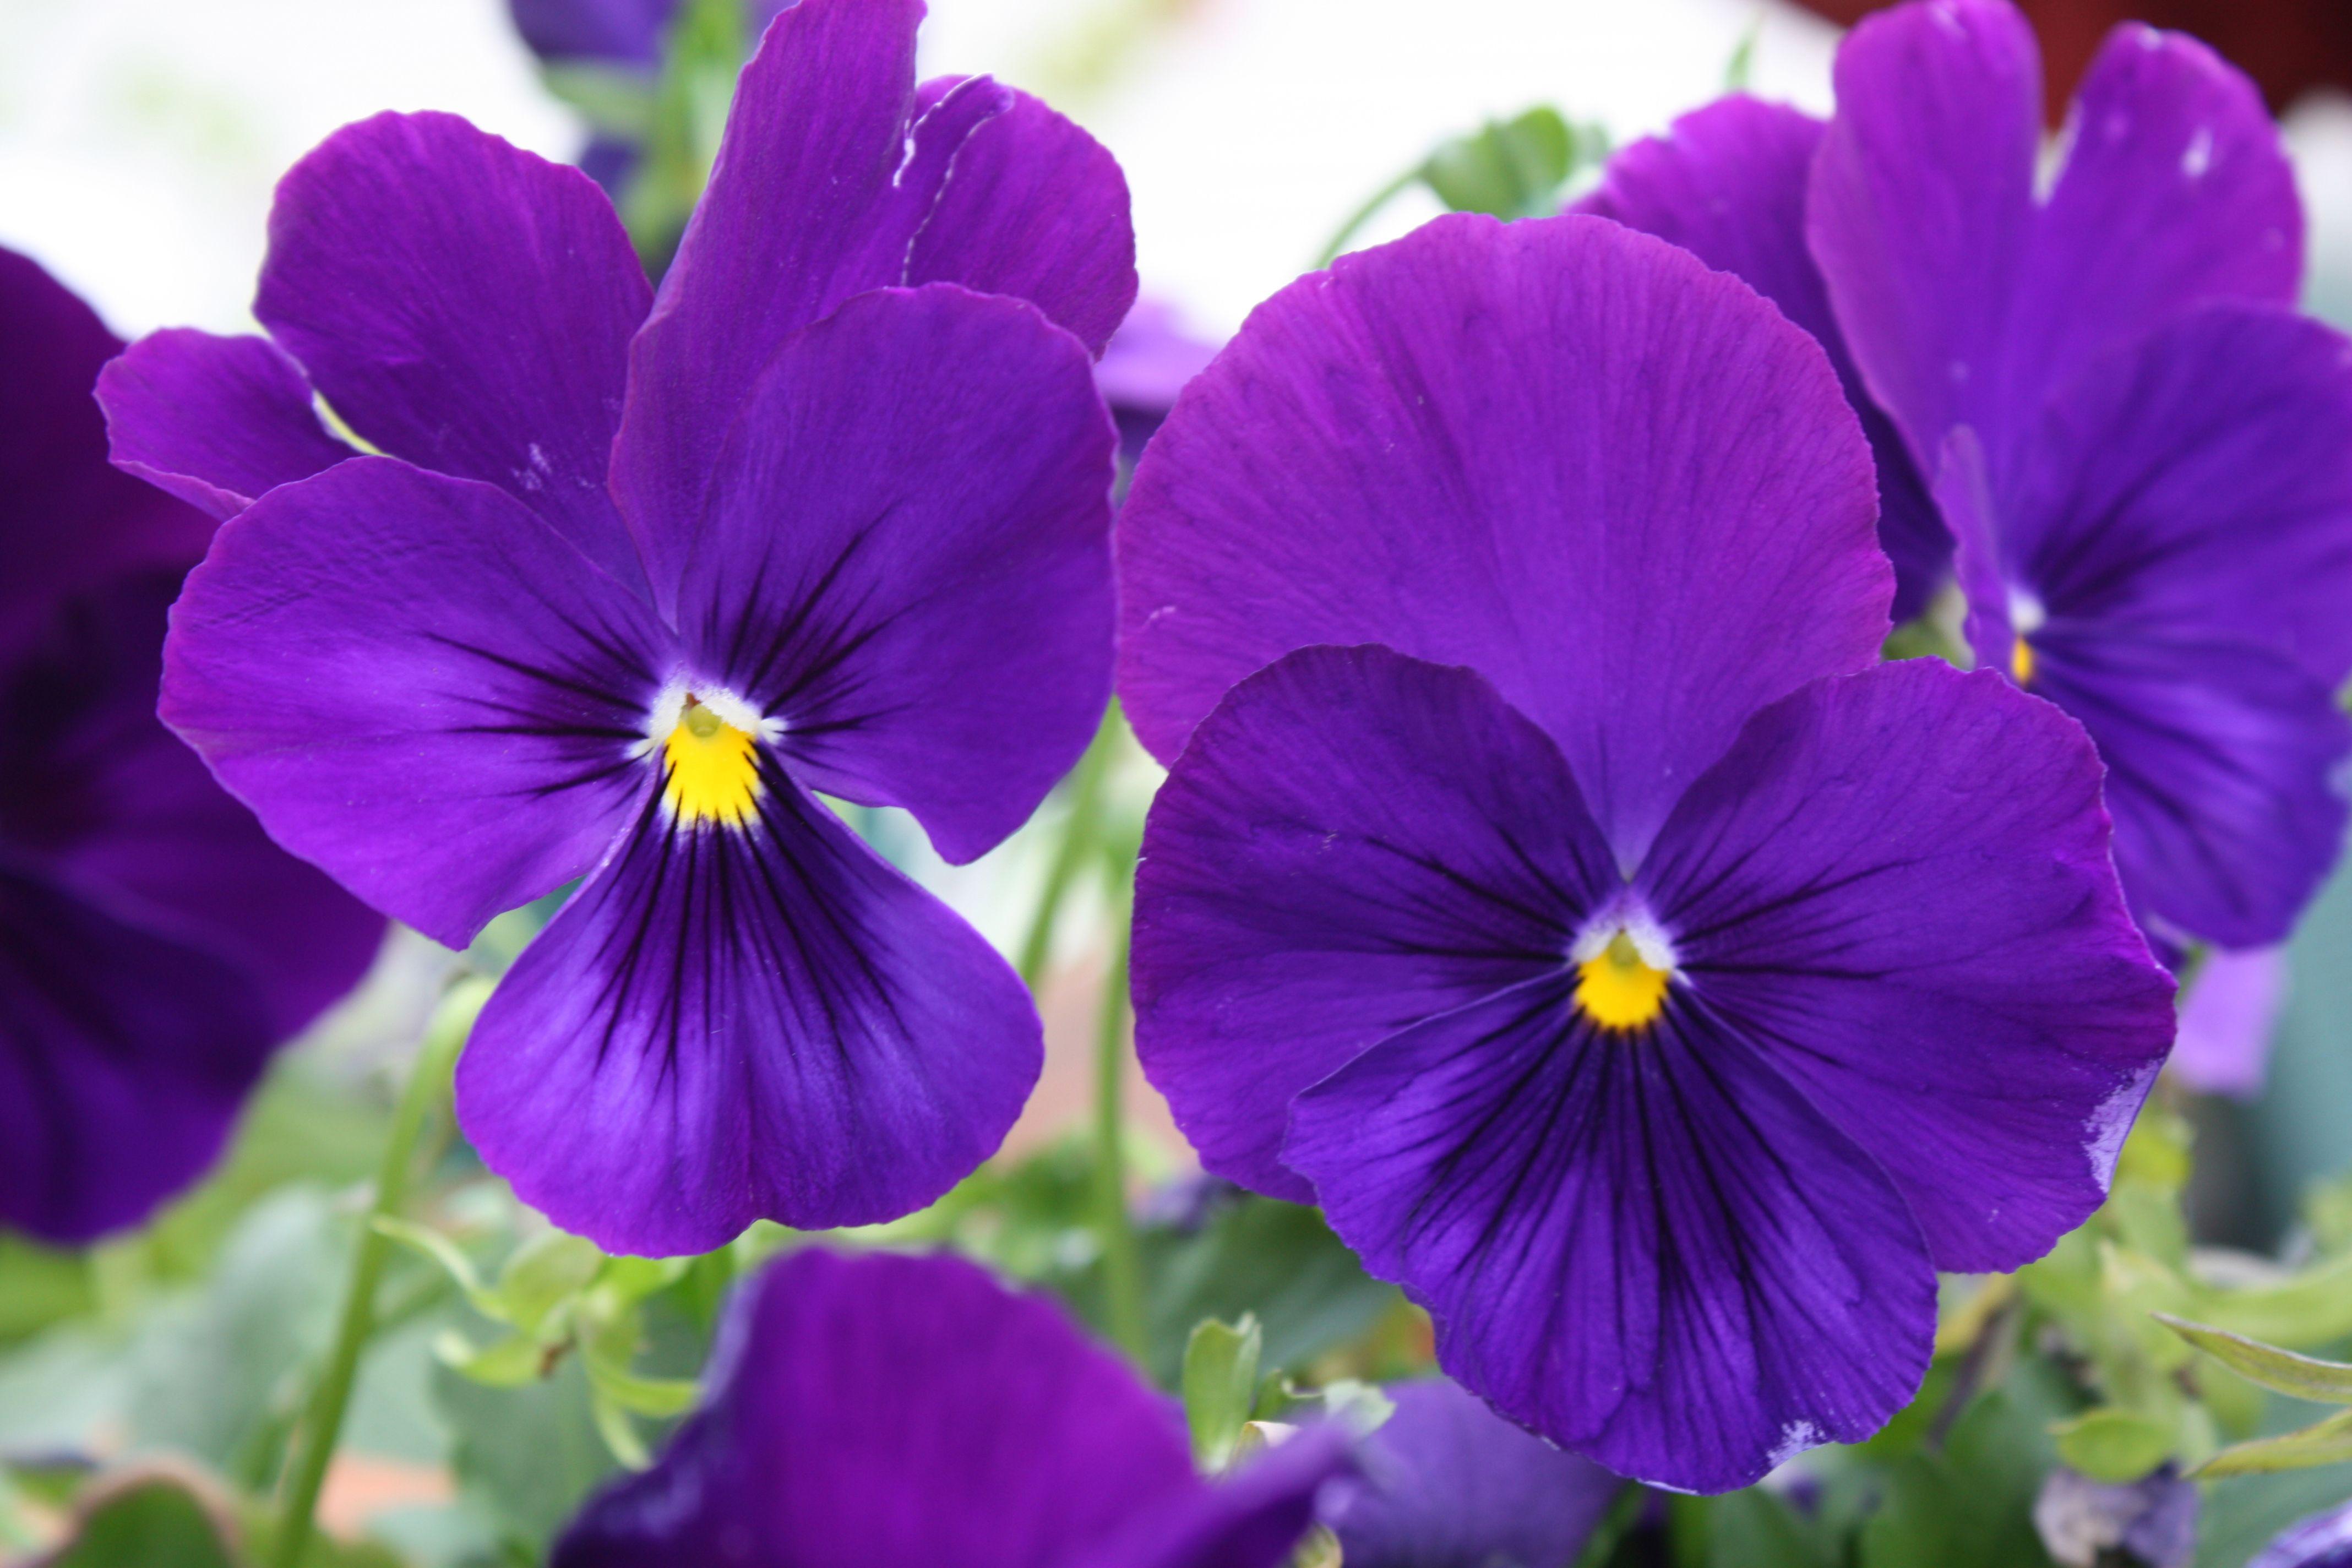 Viola- johnny jump-ups- purple yellow center